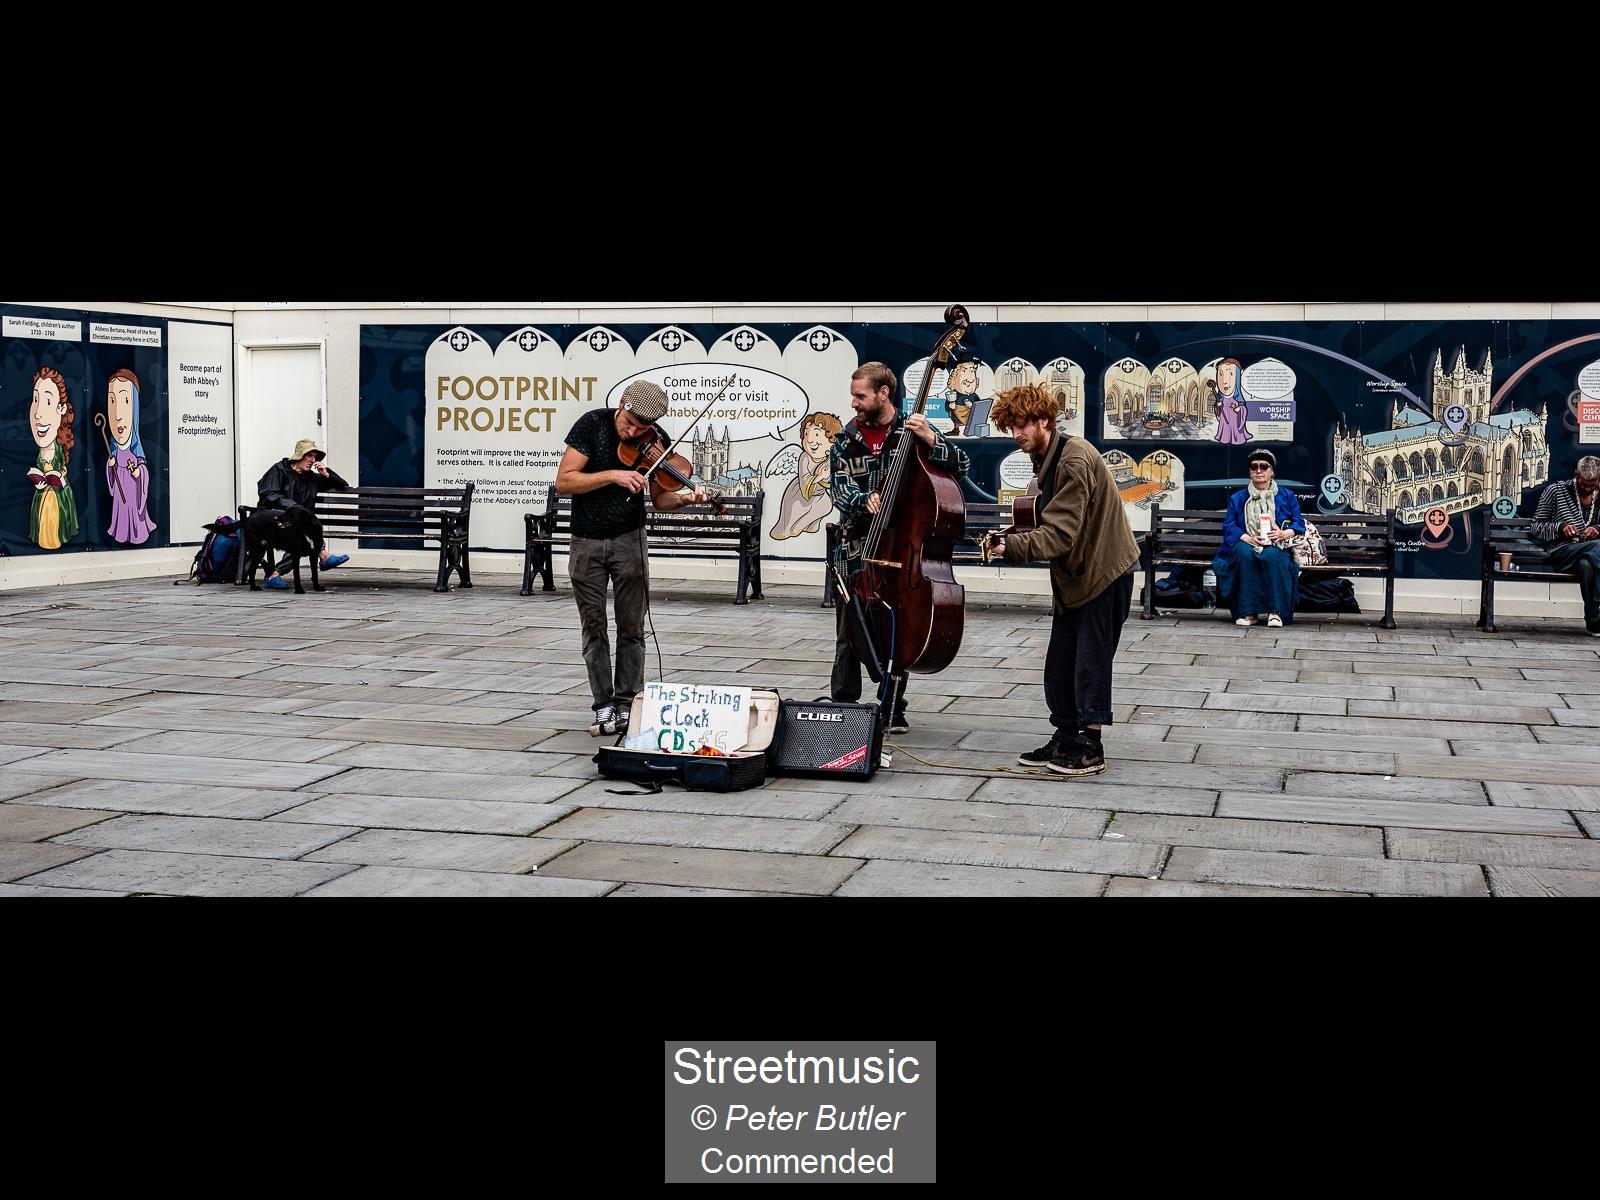 Peter Butler_Streetmusic_Comm